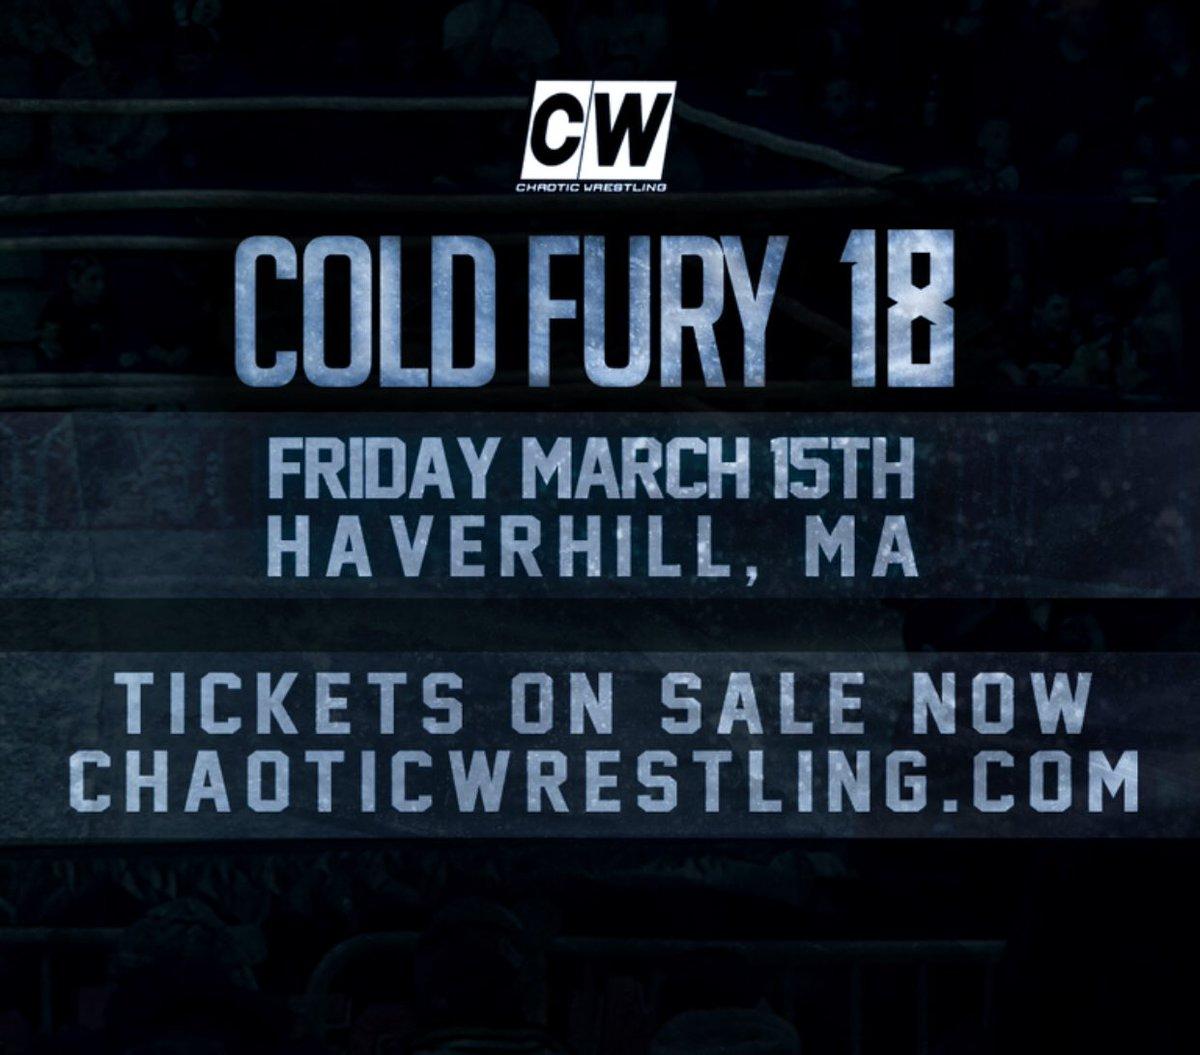 Cold Fury 18